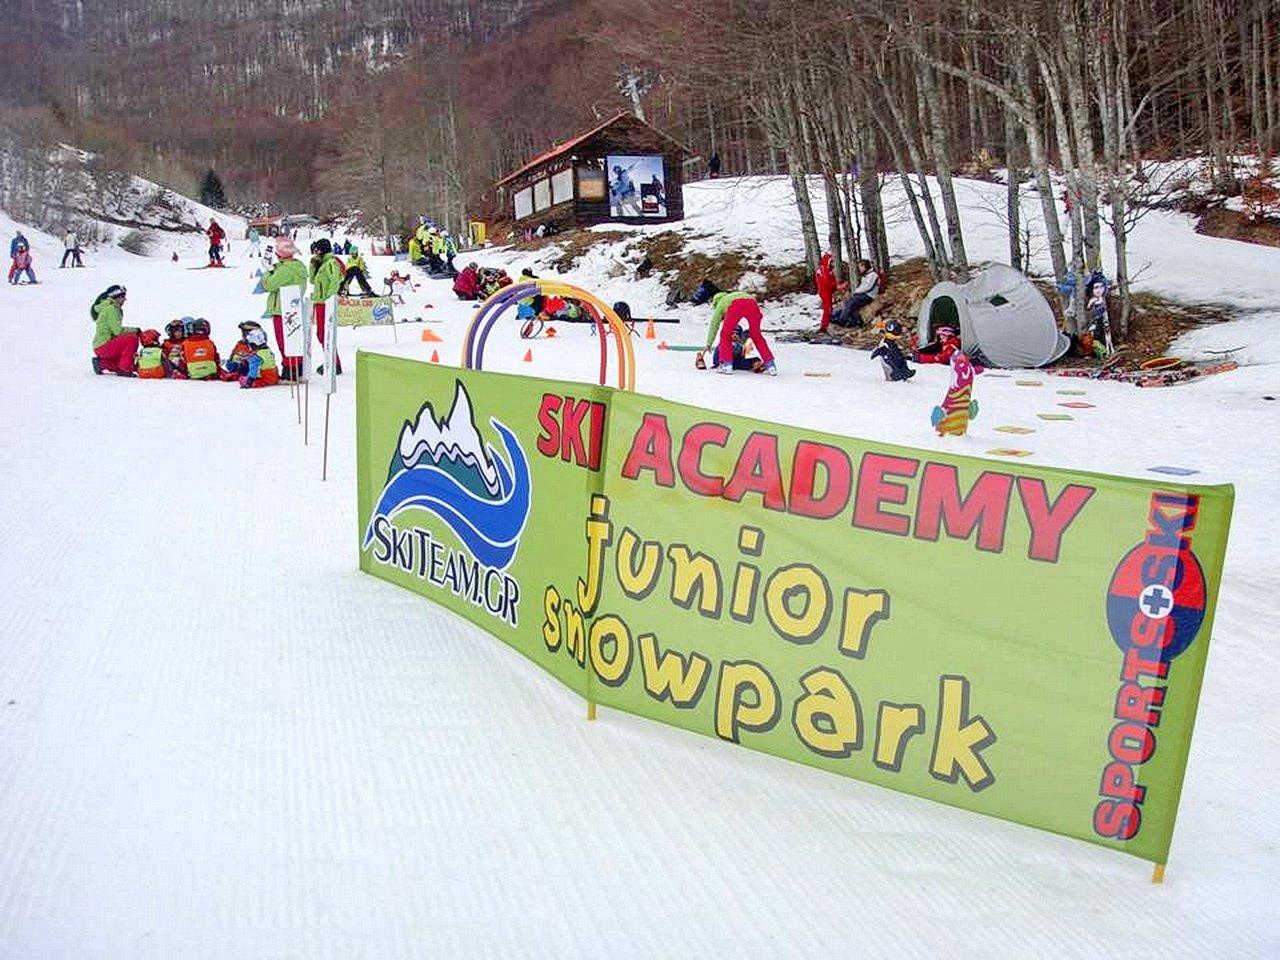 skiteam.gr-ski-academy-thessaloniki-2nd-weekend-18-19-january-2015-3-5-pigadiai-08